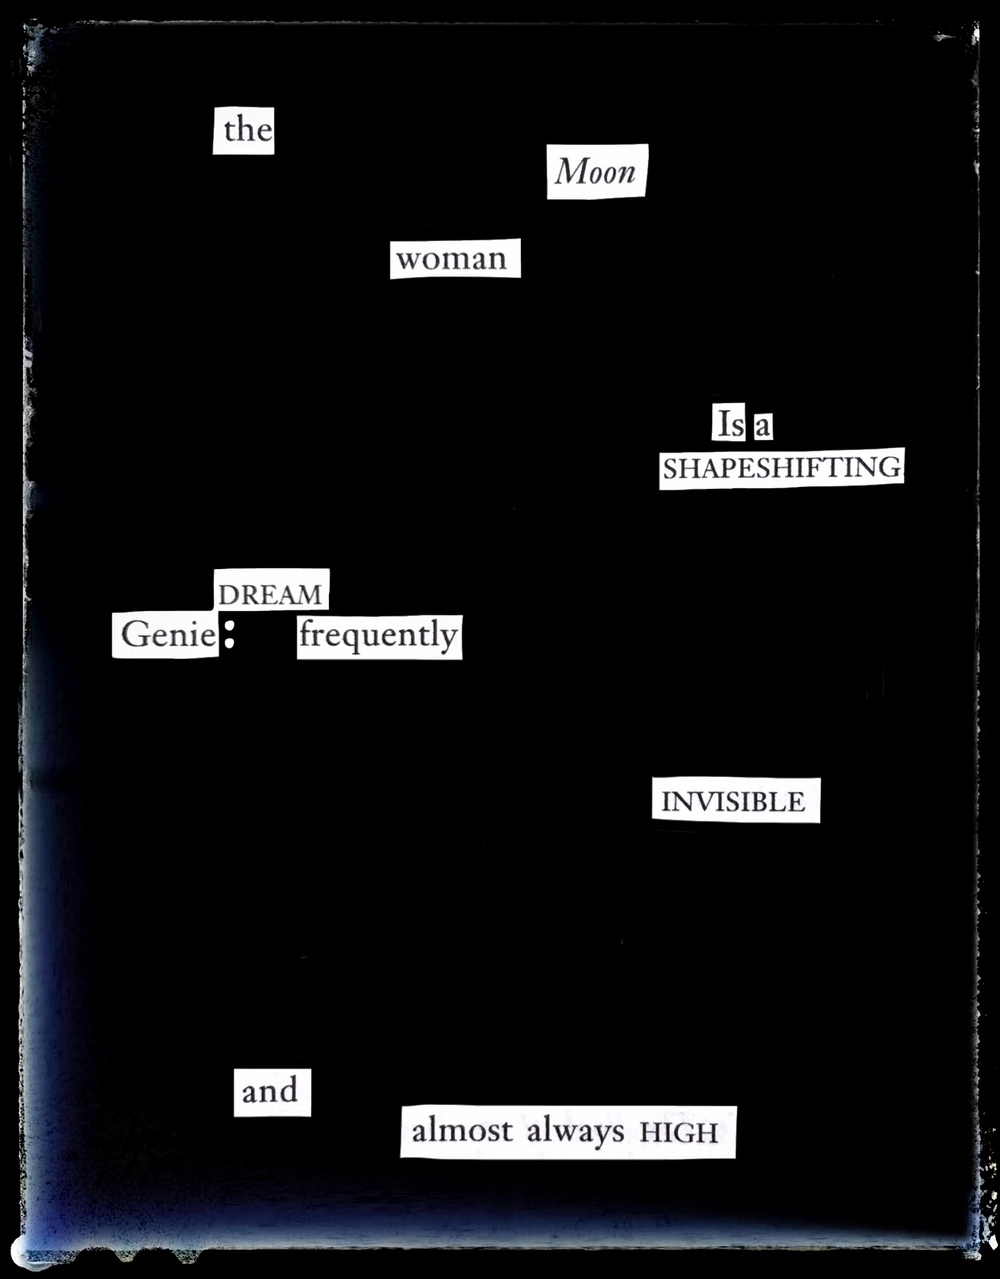 The Moon Woman ,Divyam Bernstein, 2016